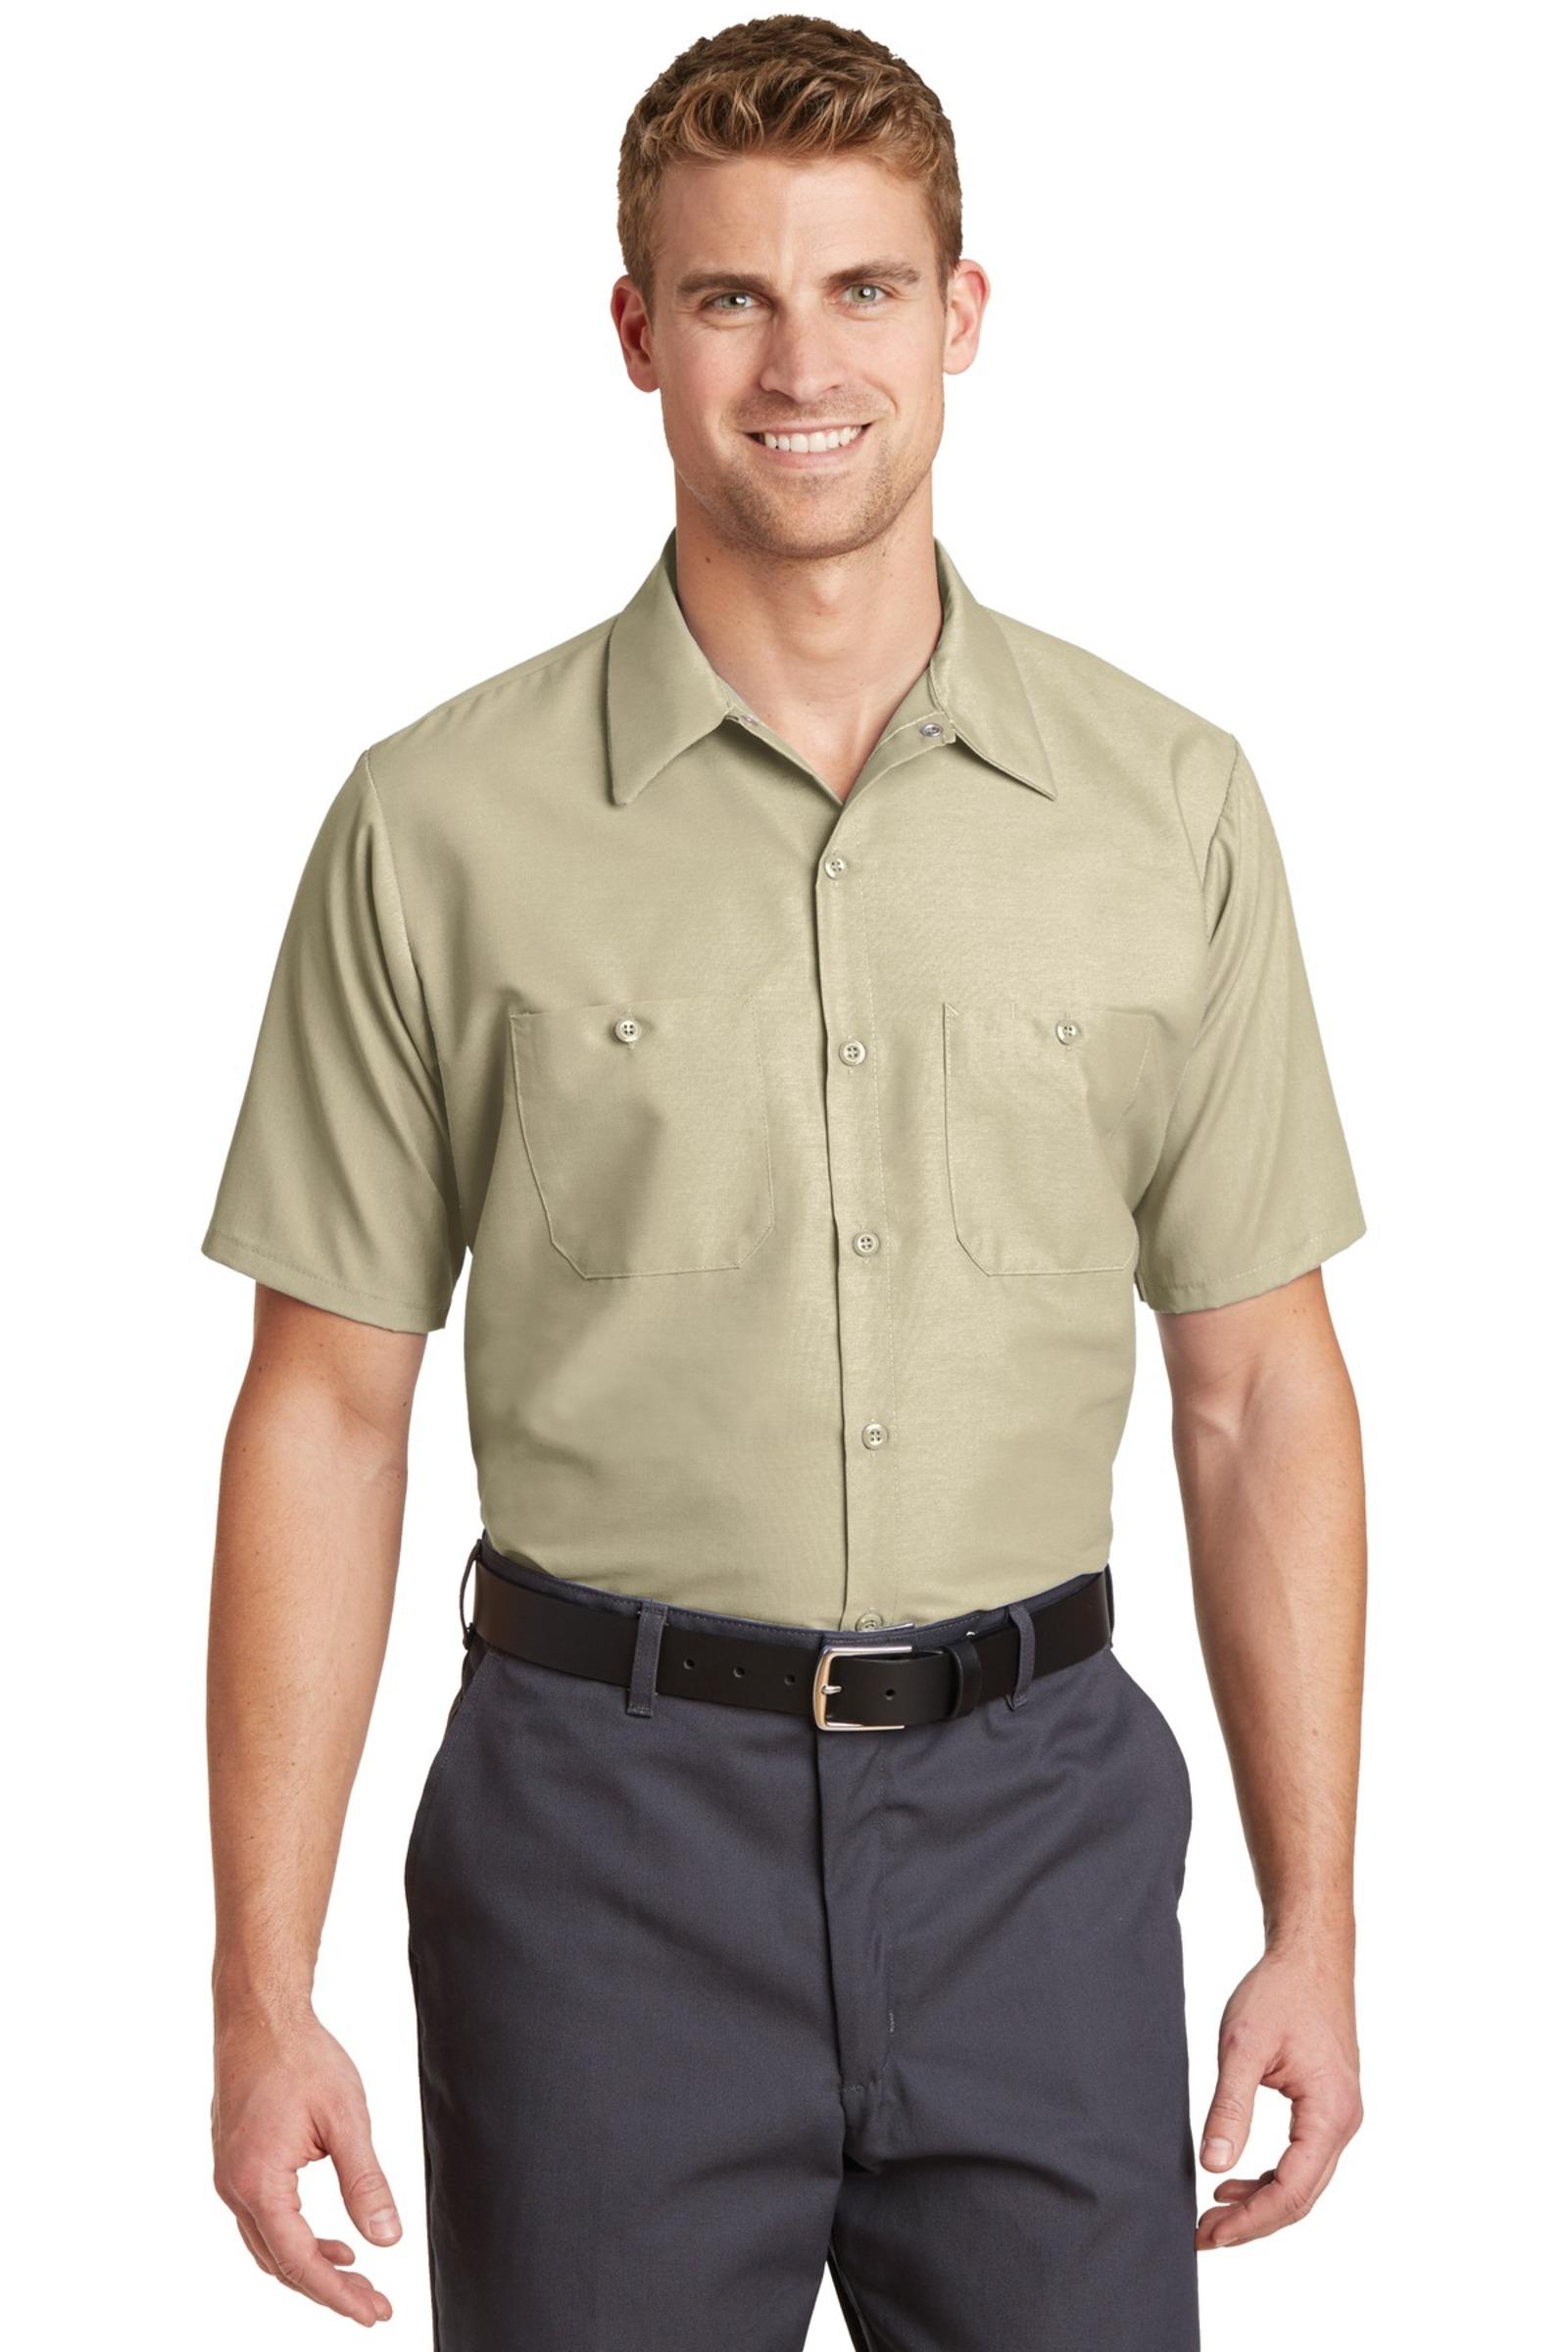 Red Kap Embroidered Men's Short Sleeve Industrial Work Shirt